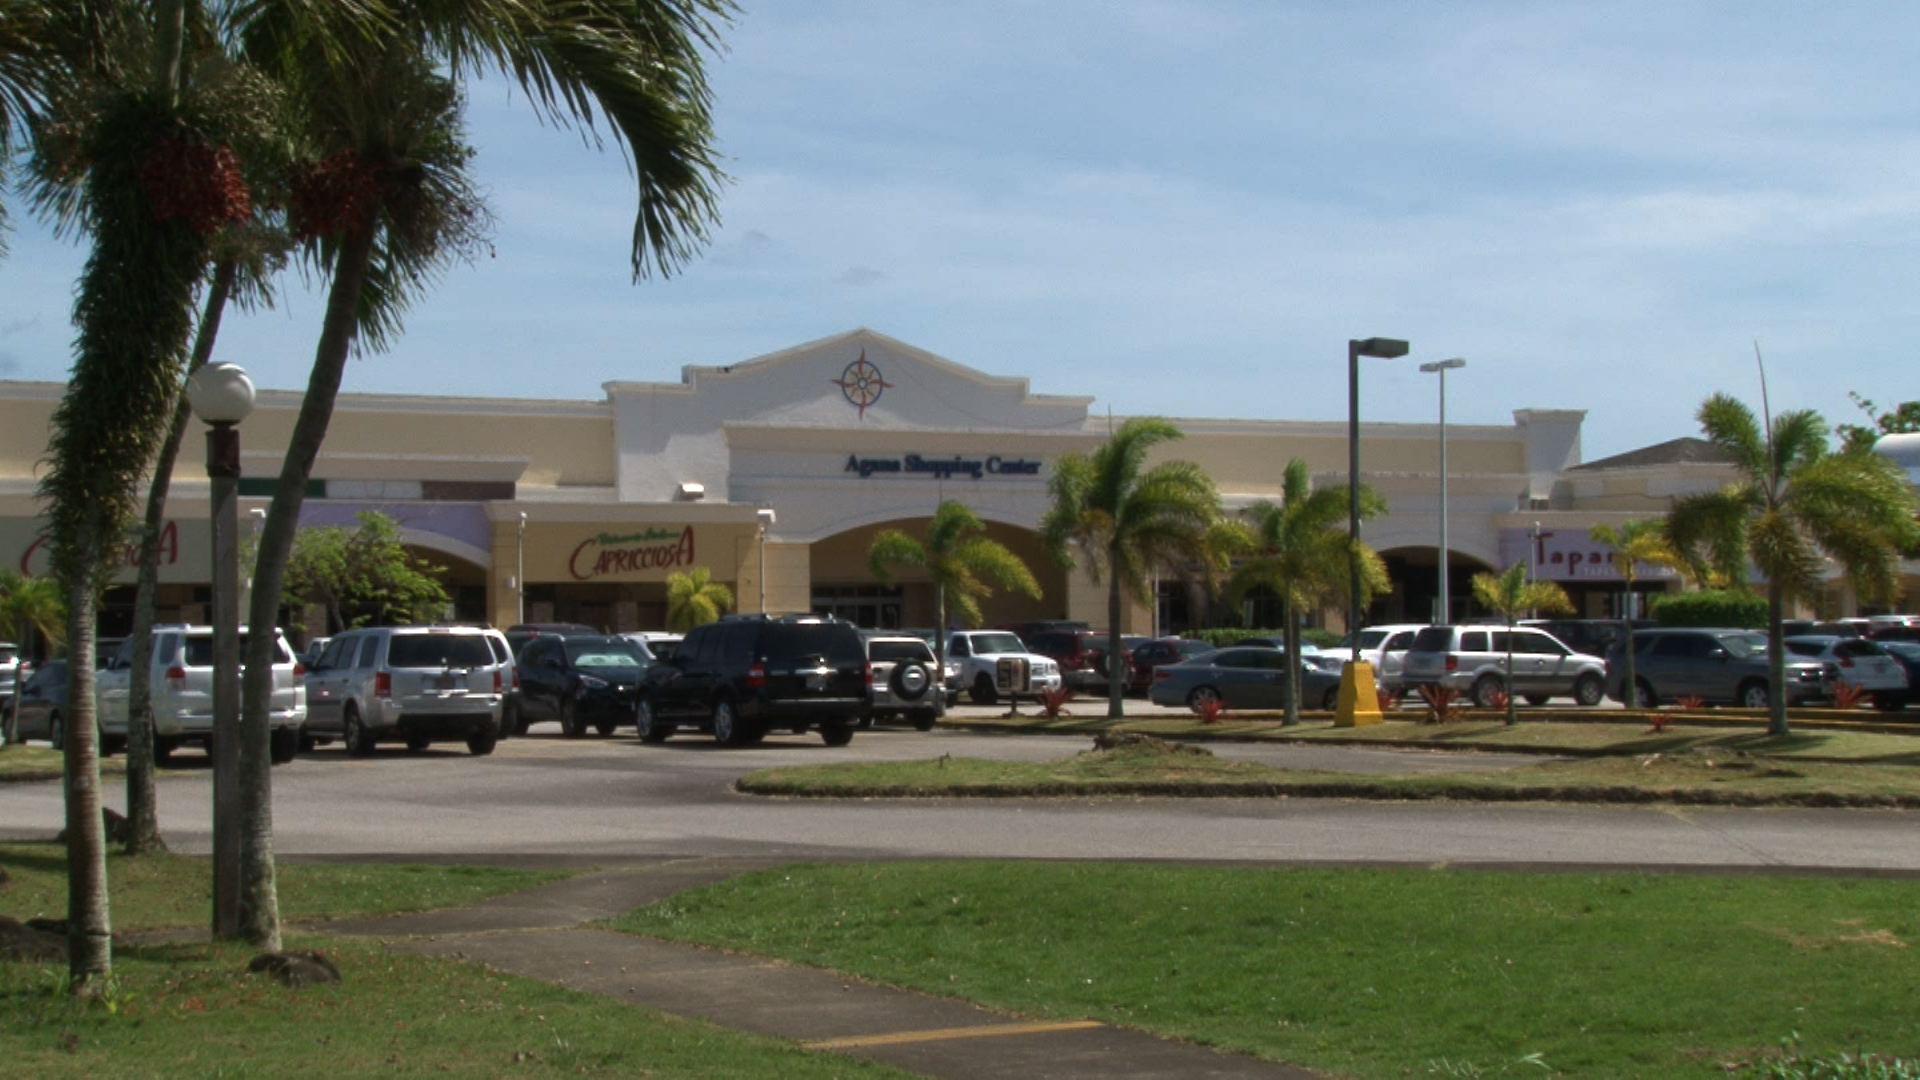 payless shopping center